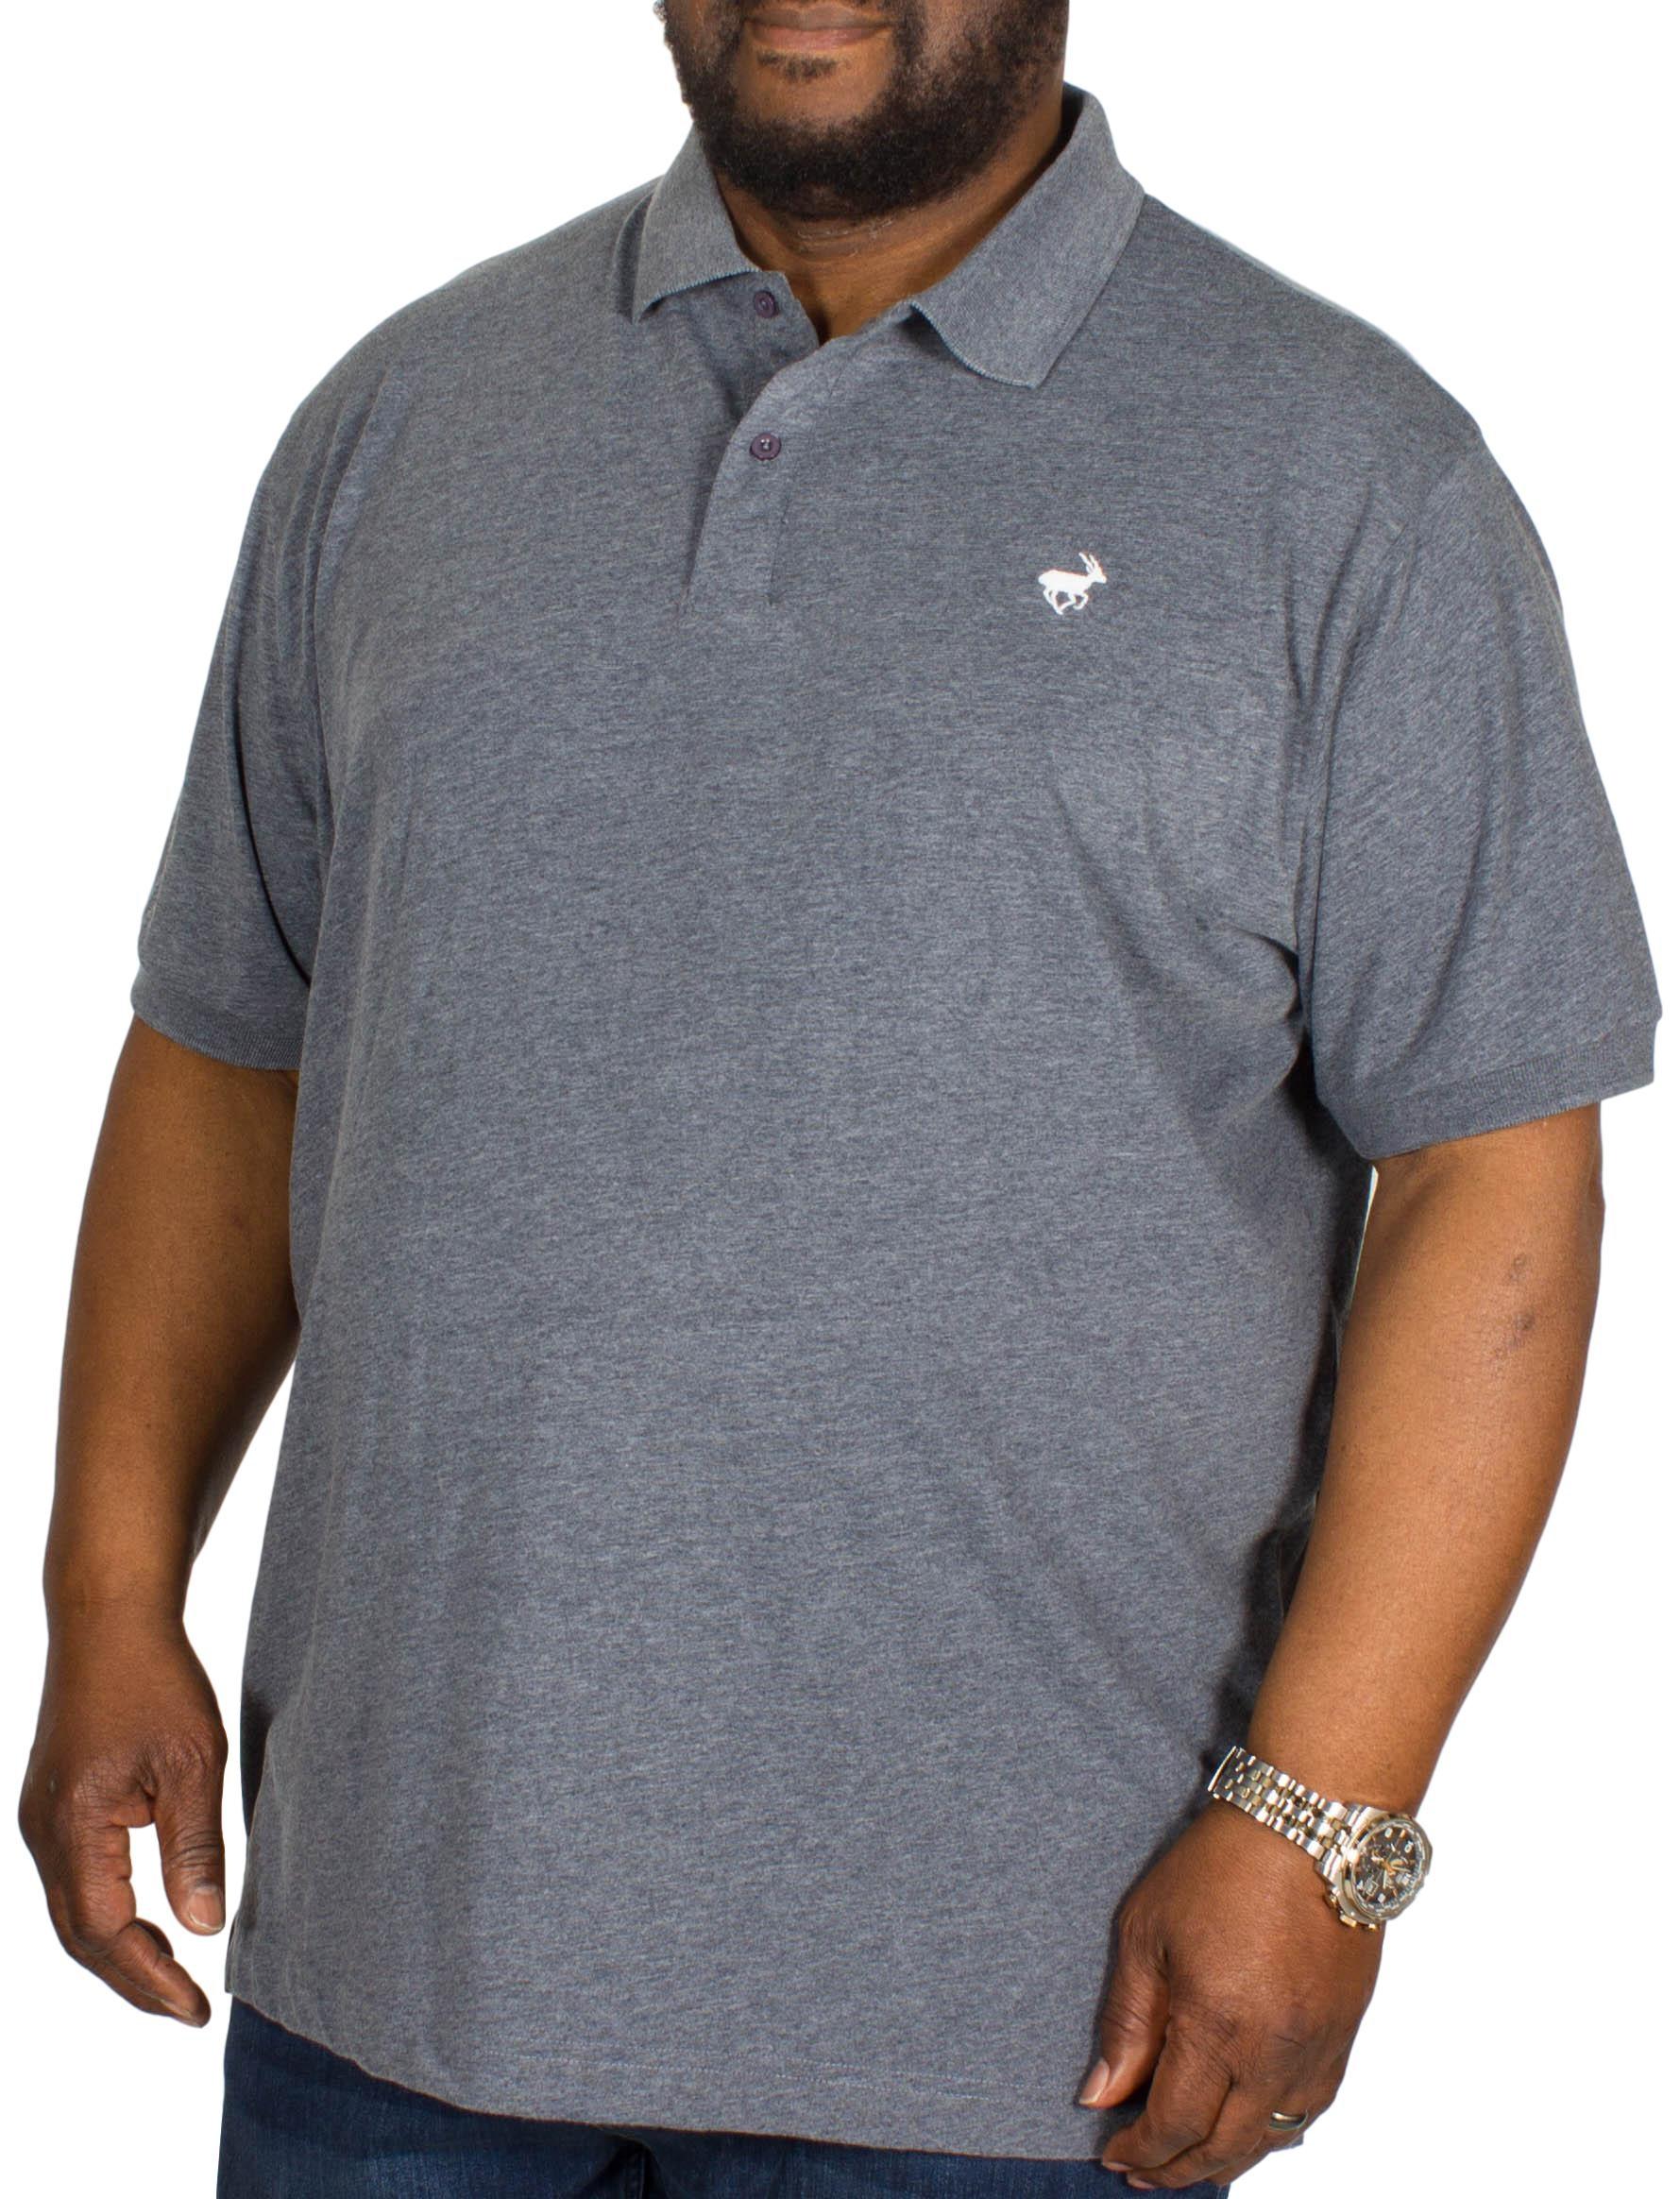 Bigdude Jersey Marl Polo Shirt Navy